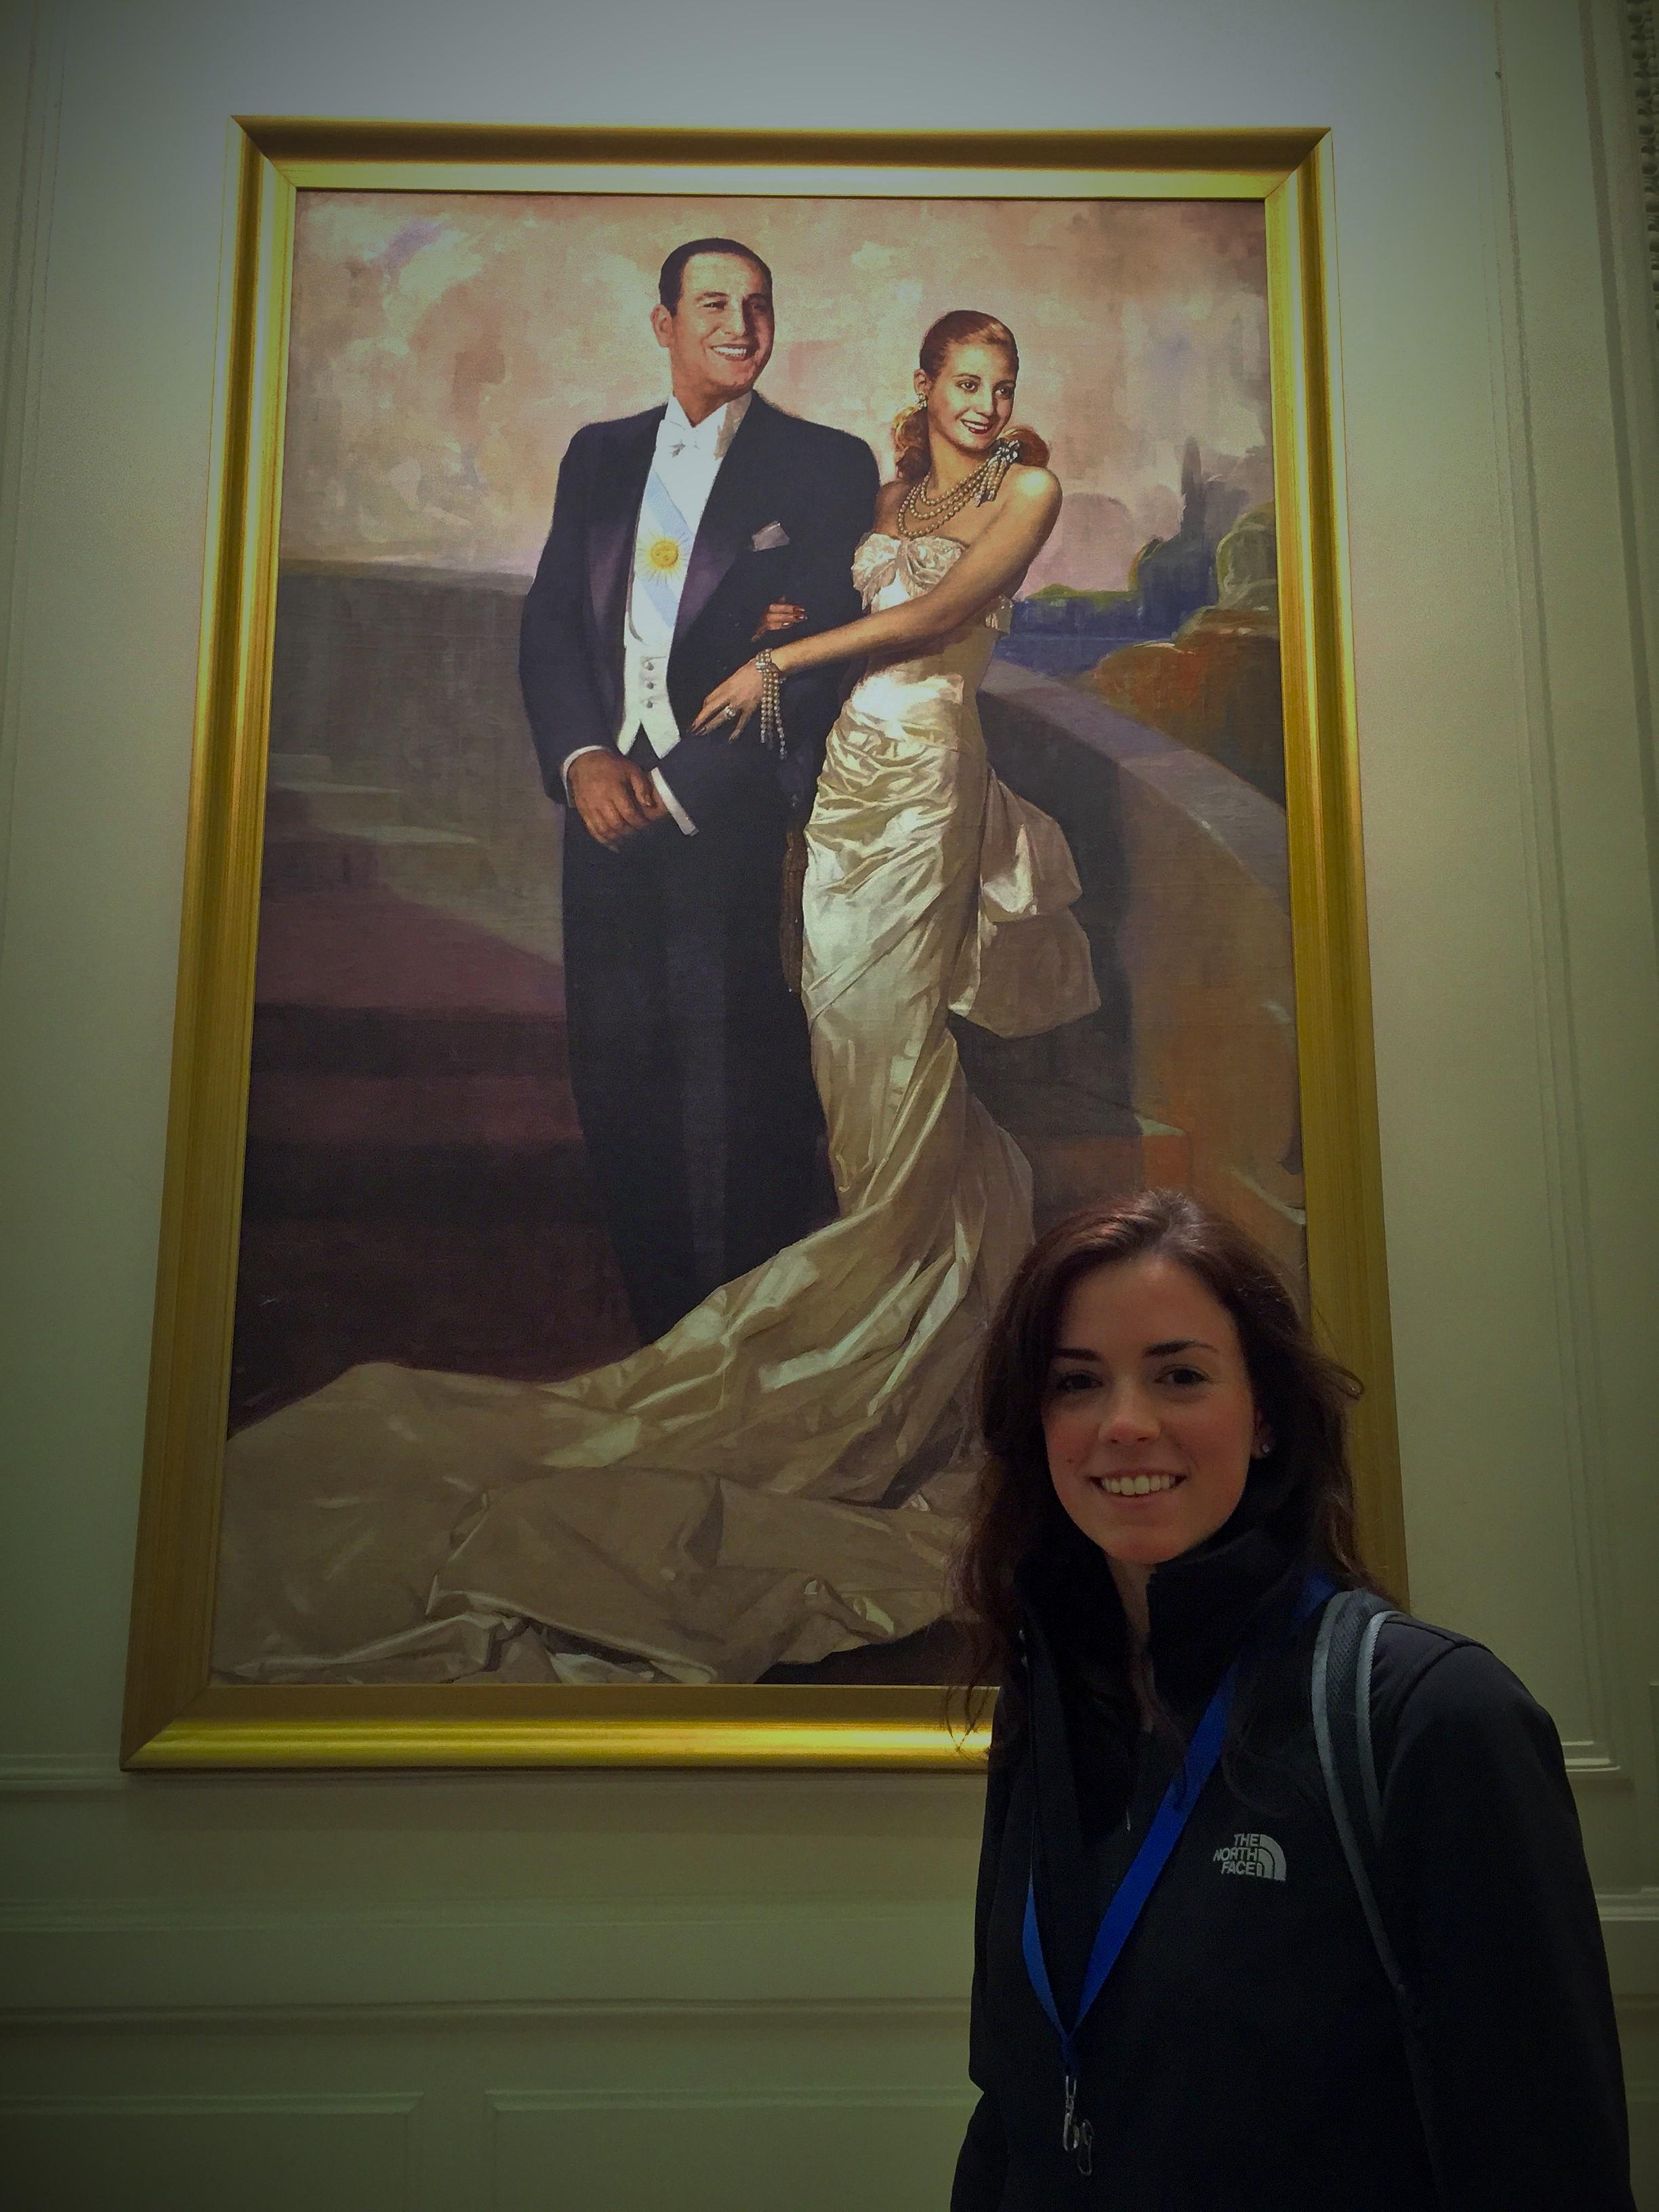 Portrait of Eva and Juan Peron hanging in Casa Rosada, the presidential palace.